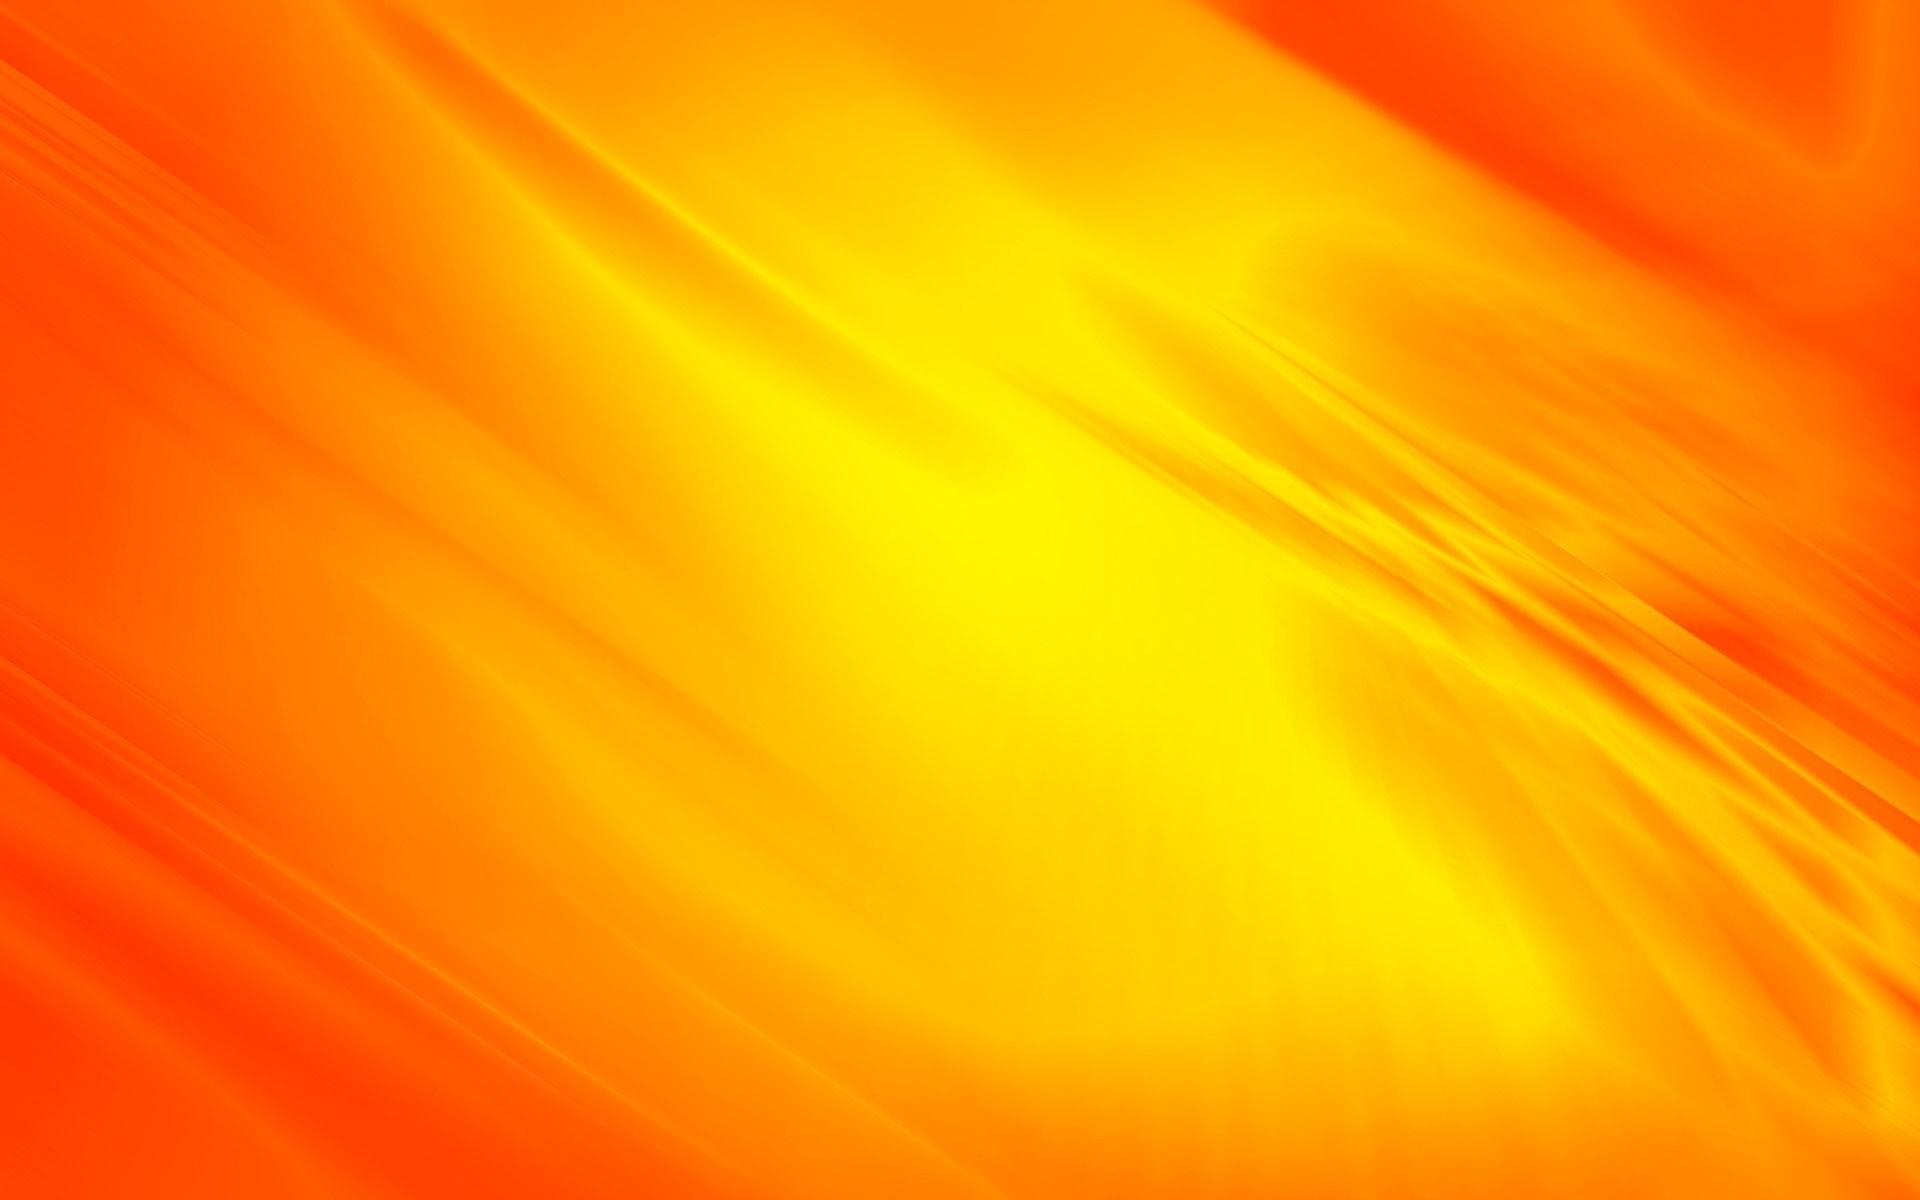 Yellow orange flowing curves wallpaper